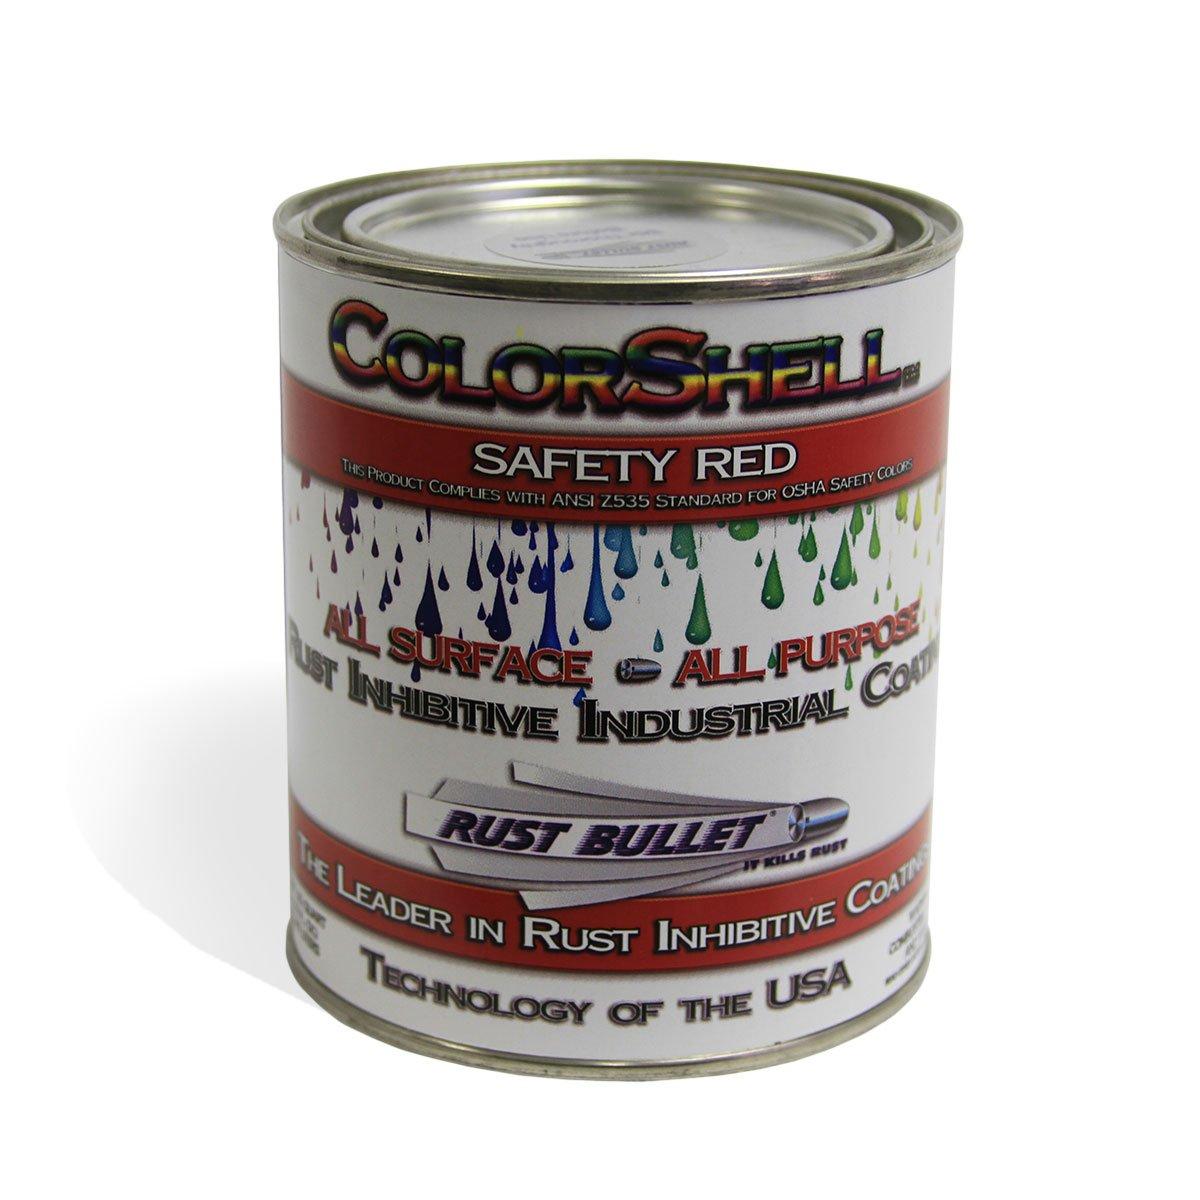 Rust Bullet CSRDQ ColorShell Rust Preventative and Protective Coating,1-Quart, Red